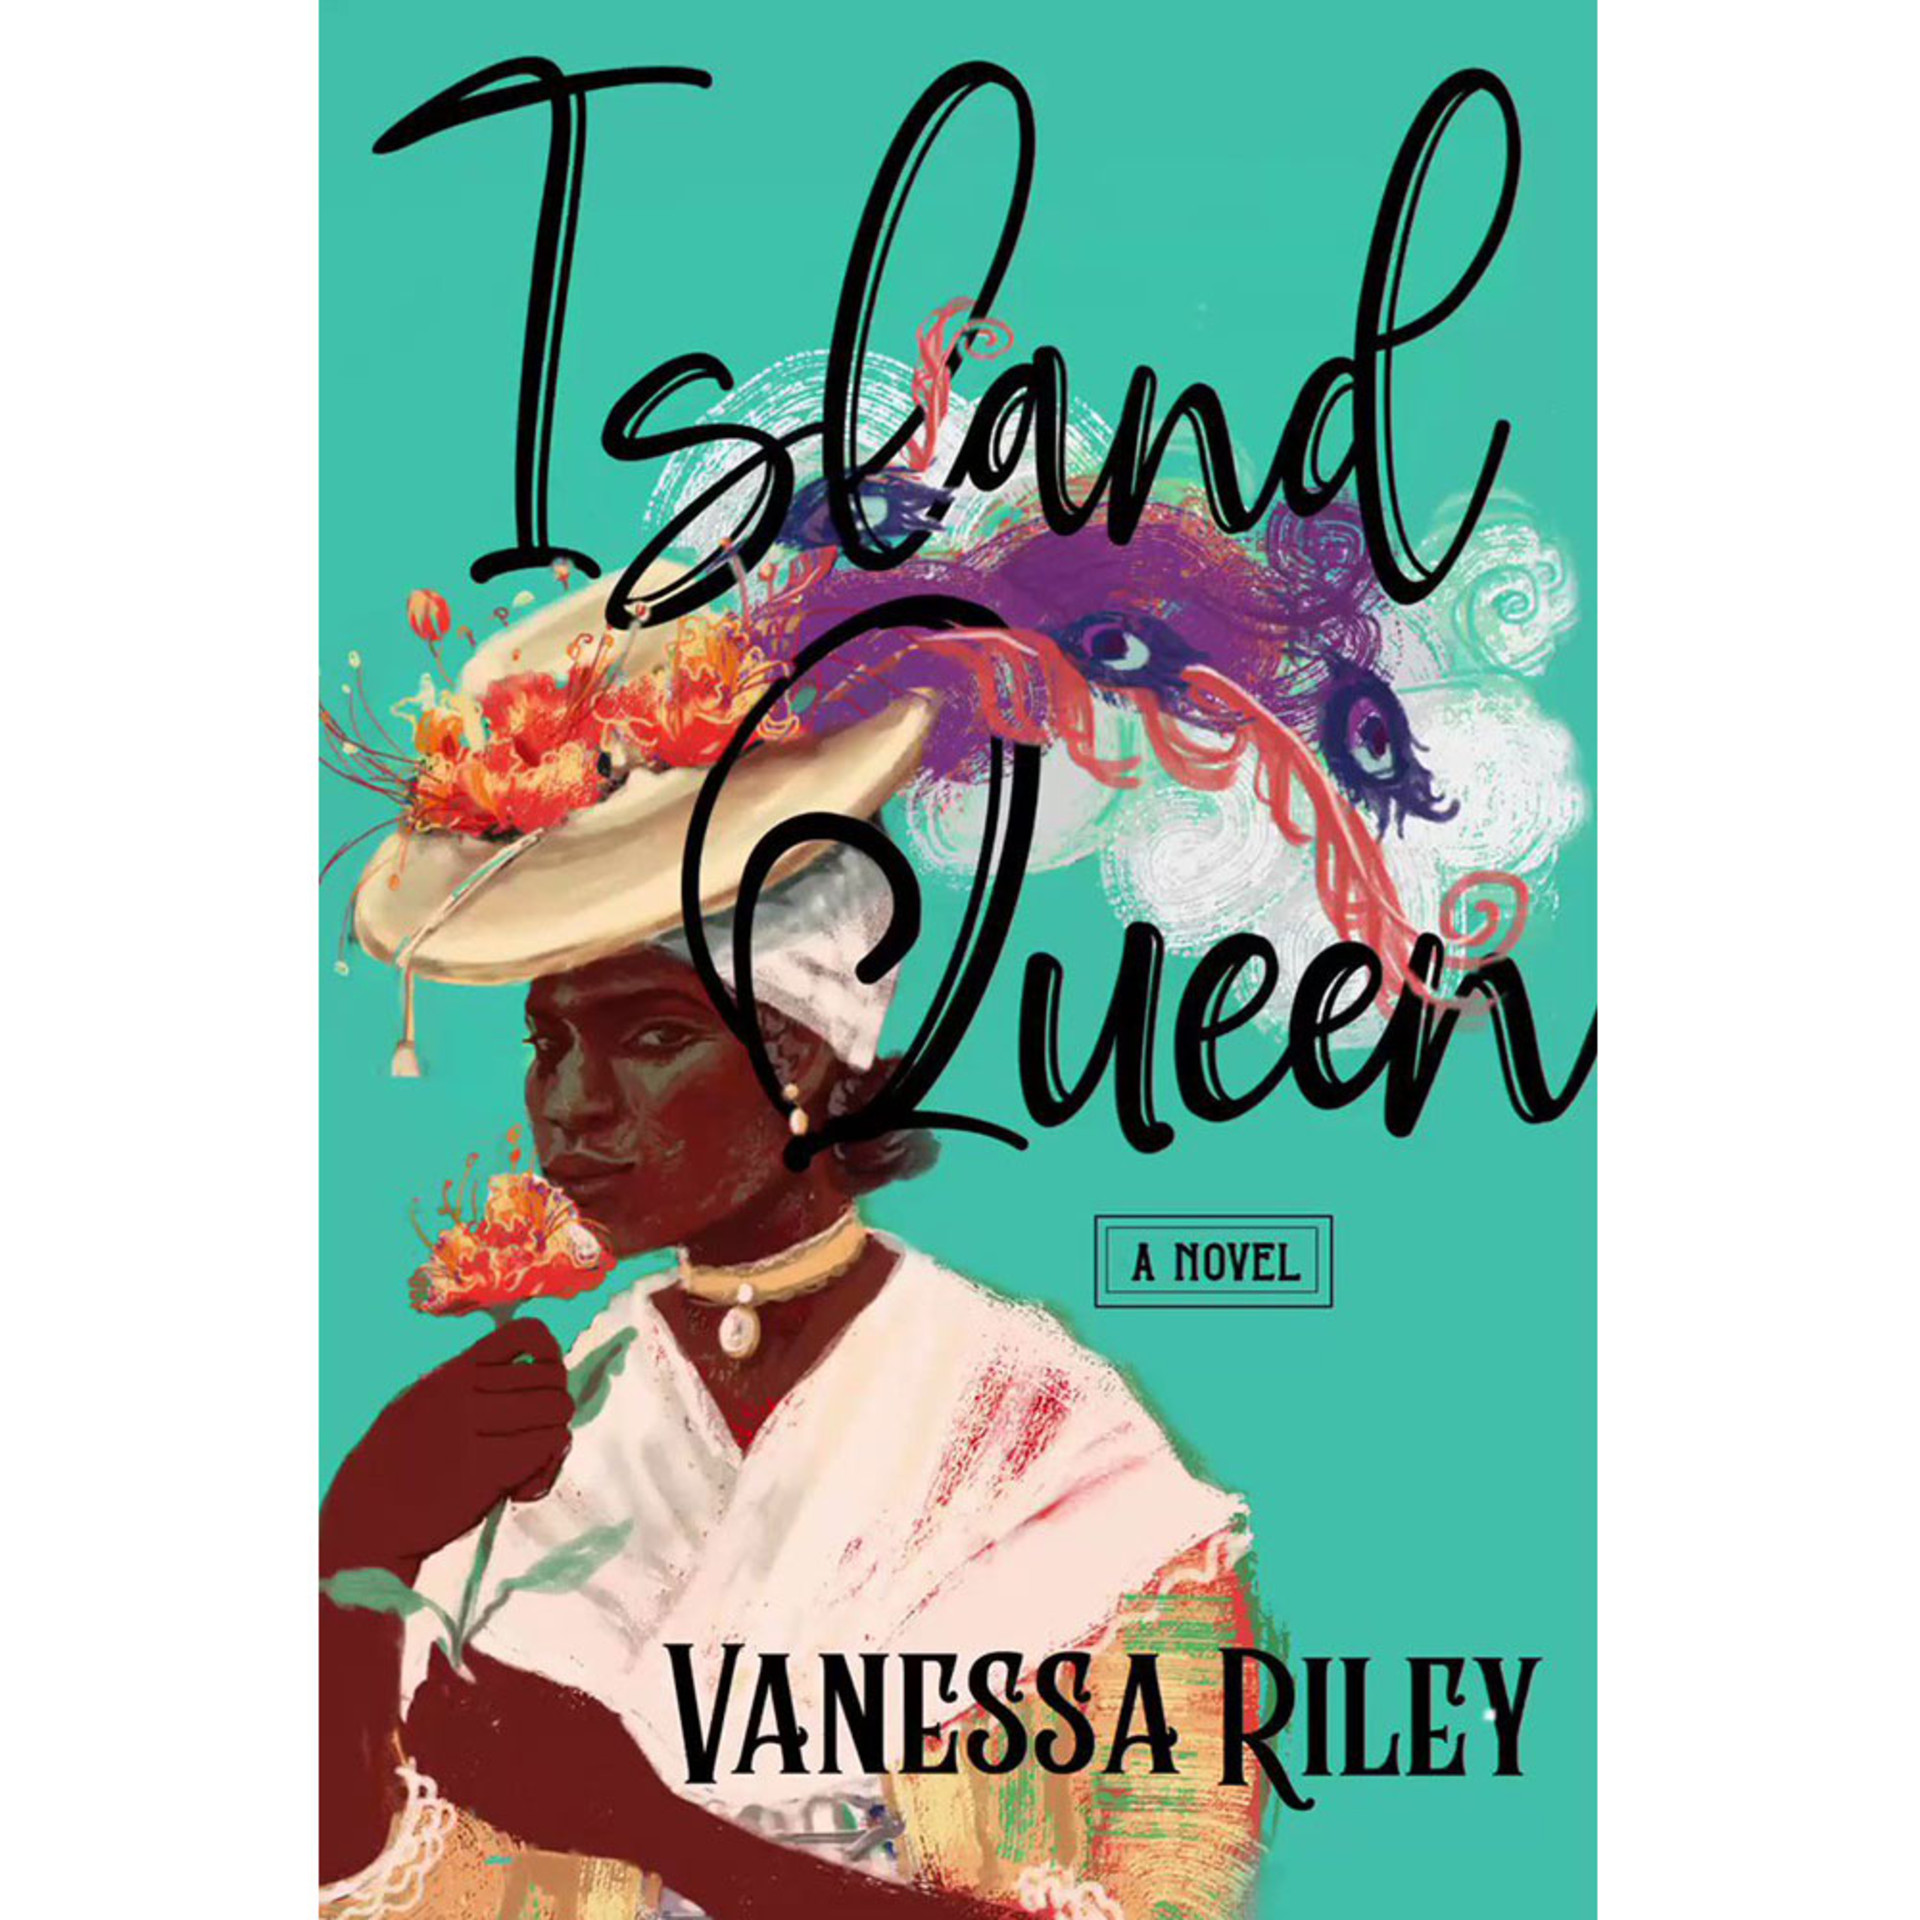 Island Queen: A Novel by Vanessa Riley